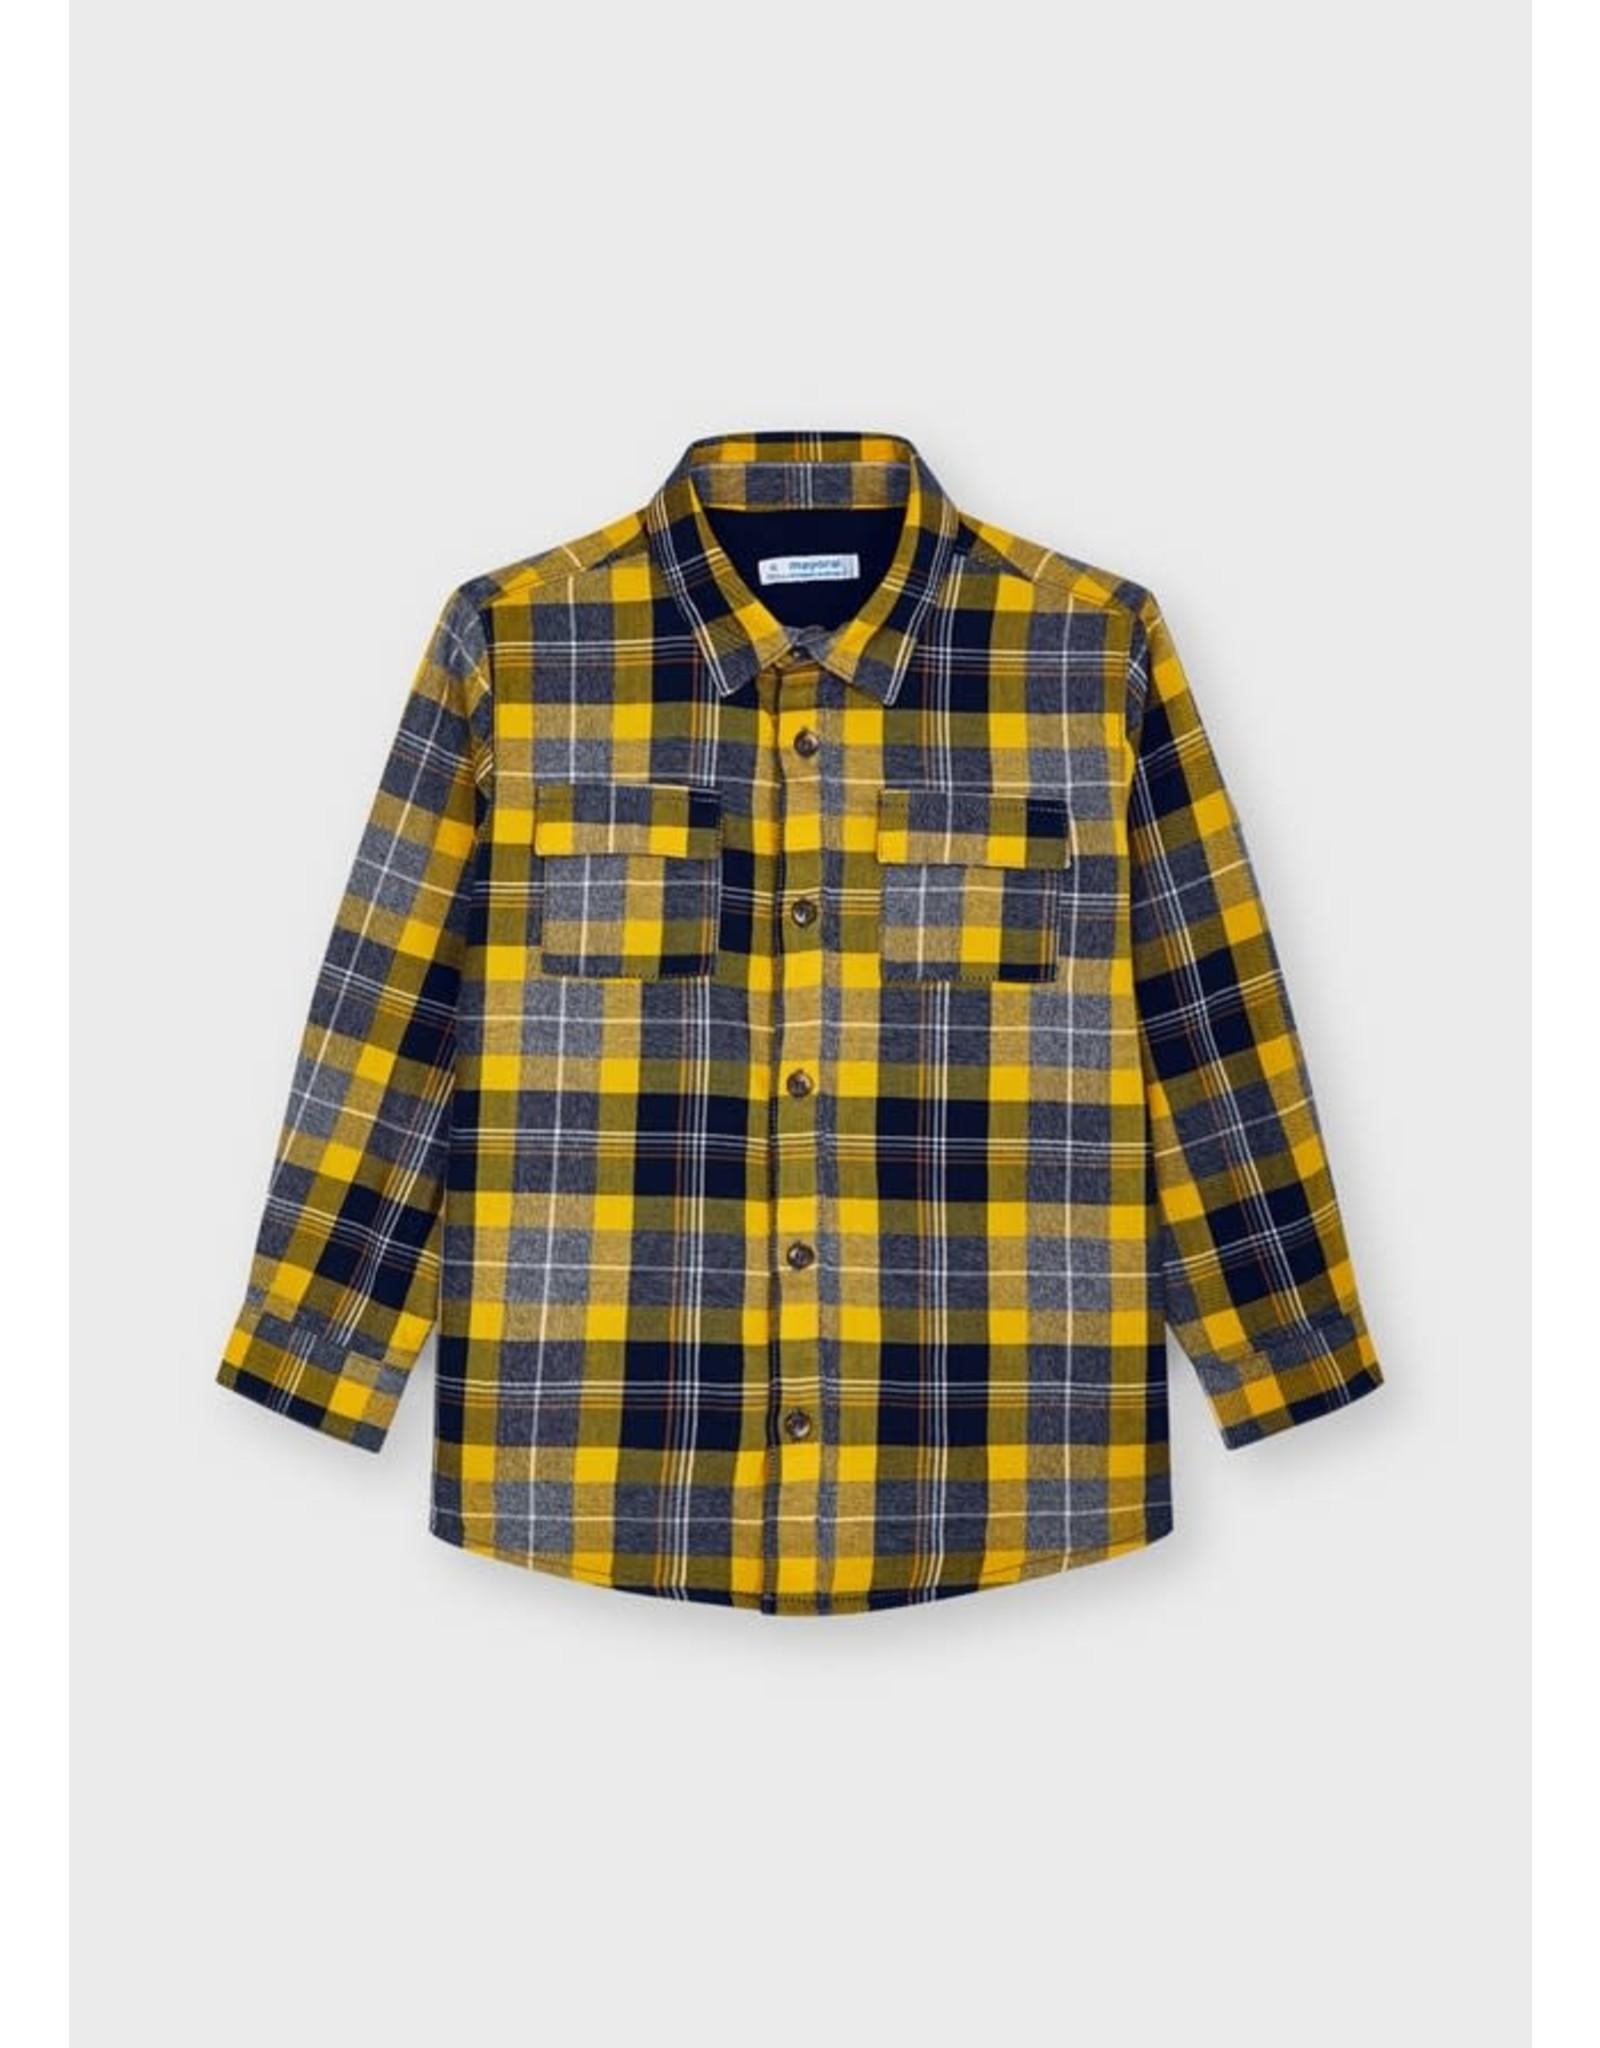 Mayoral Gold Plaid Button Shirt